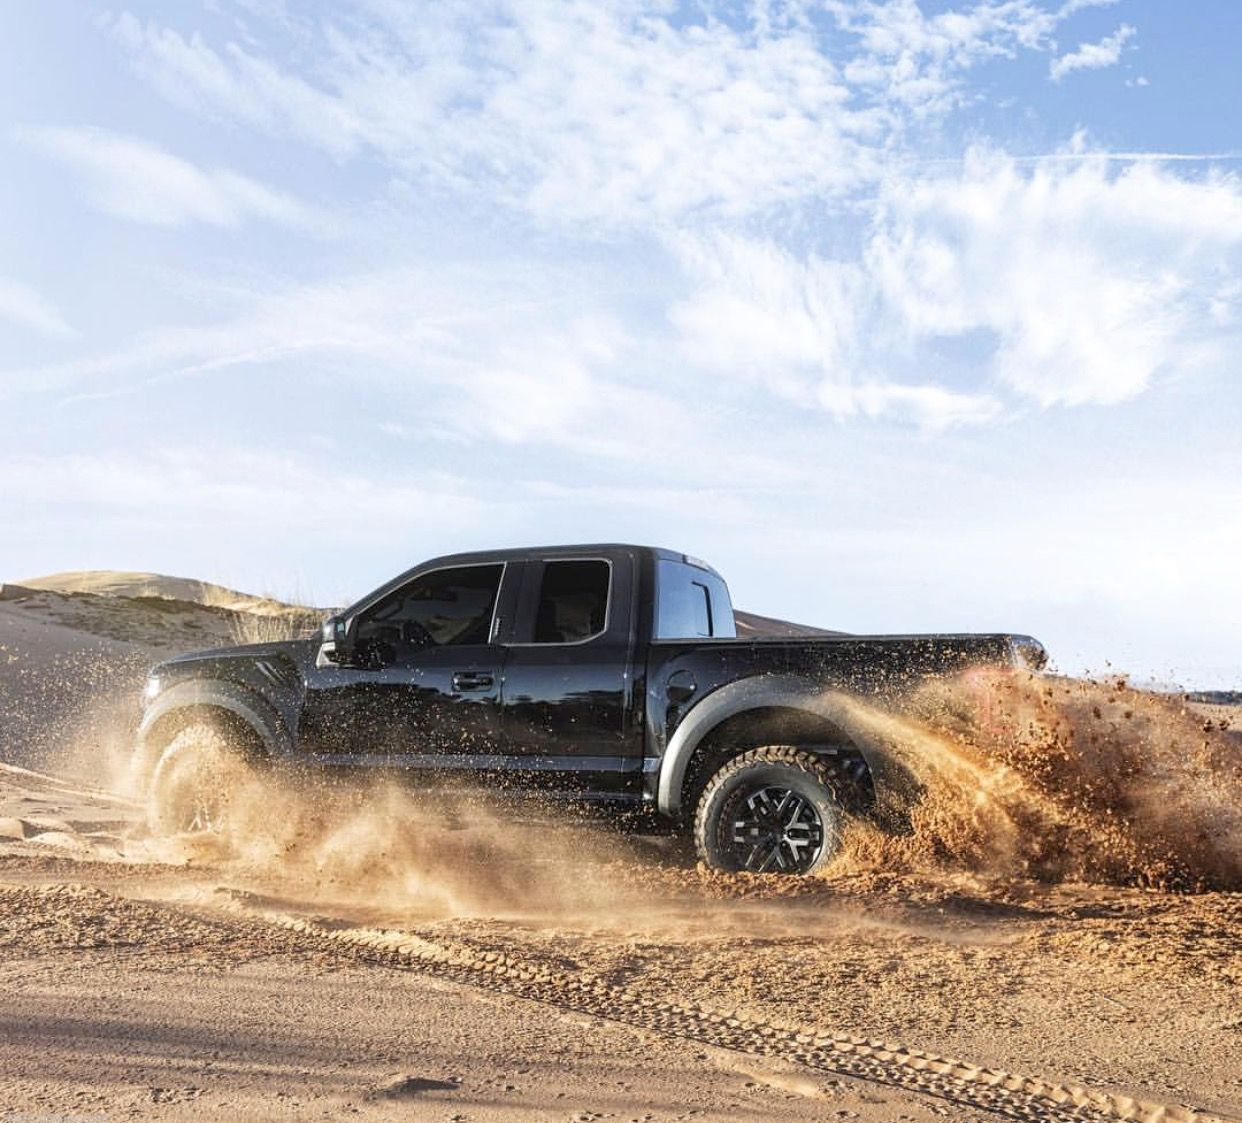 Raptor Ford raptor, Ford raptor 2017, Ford f150